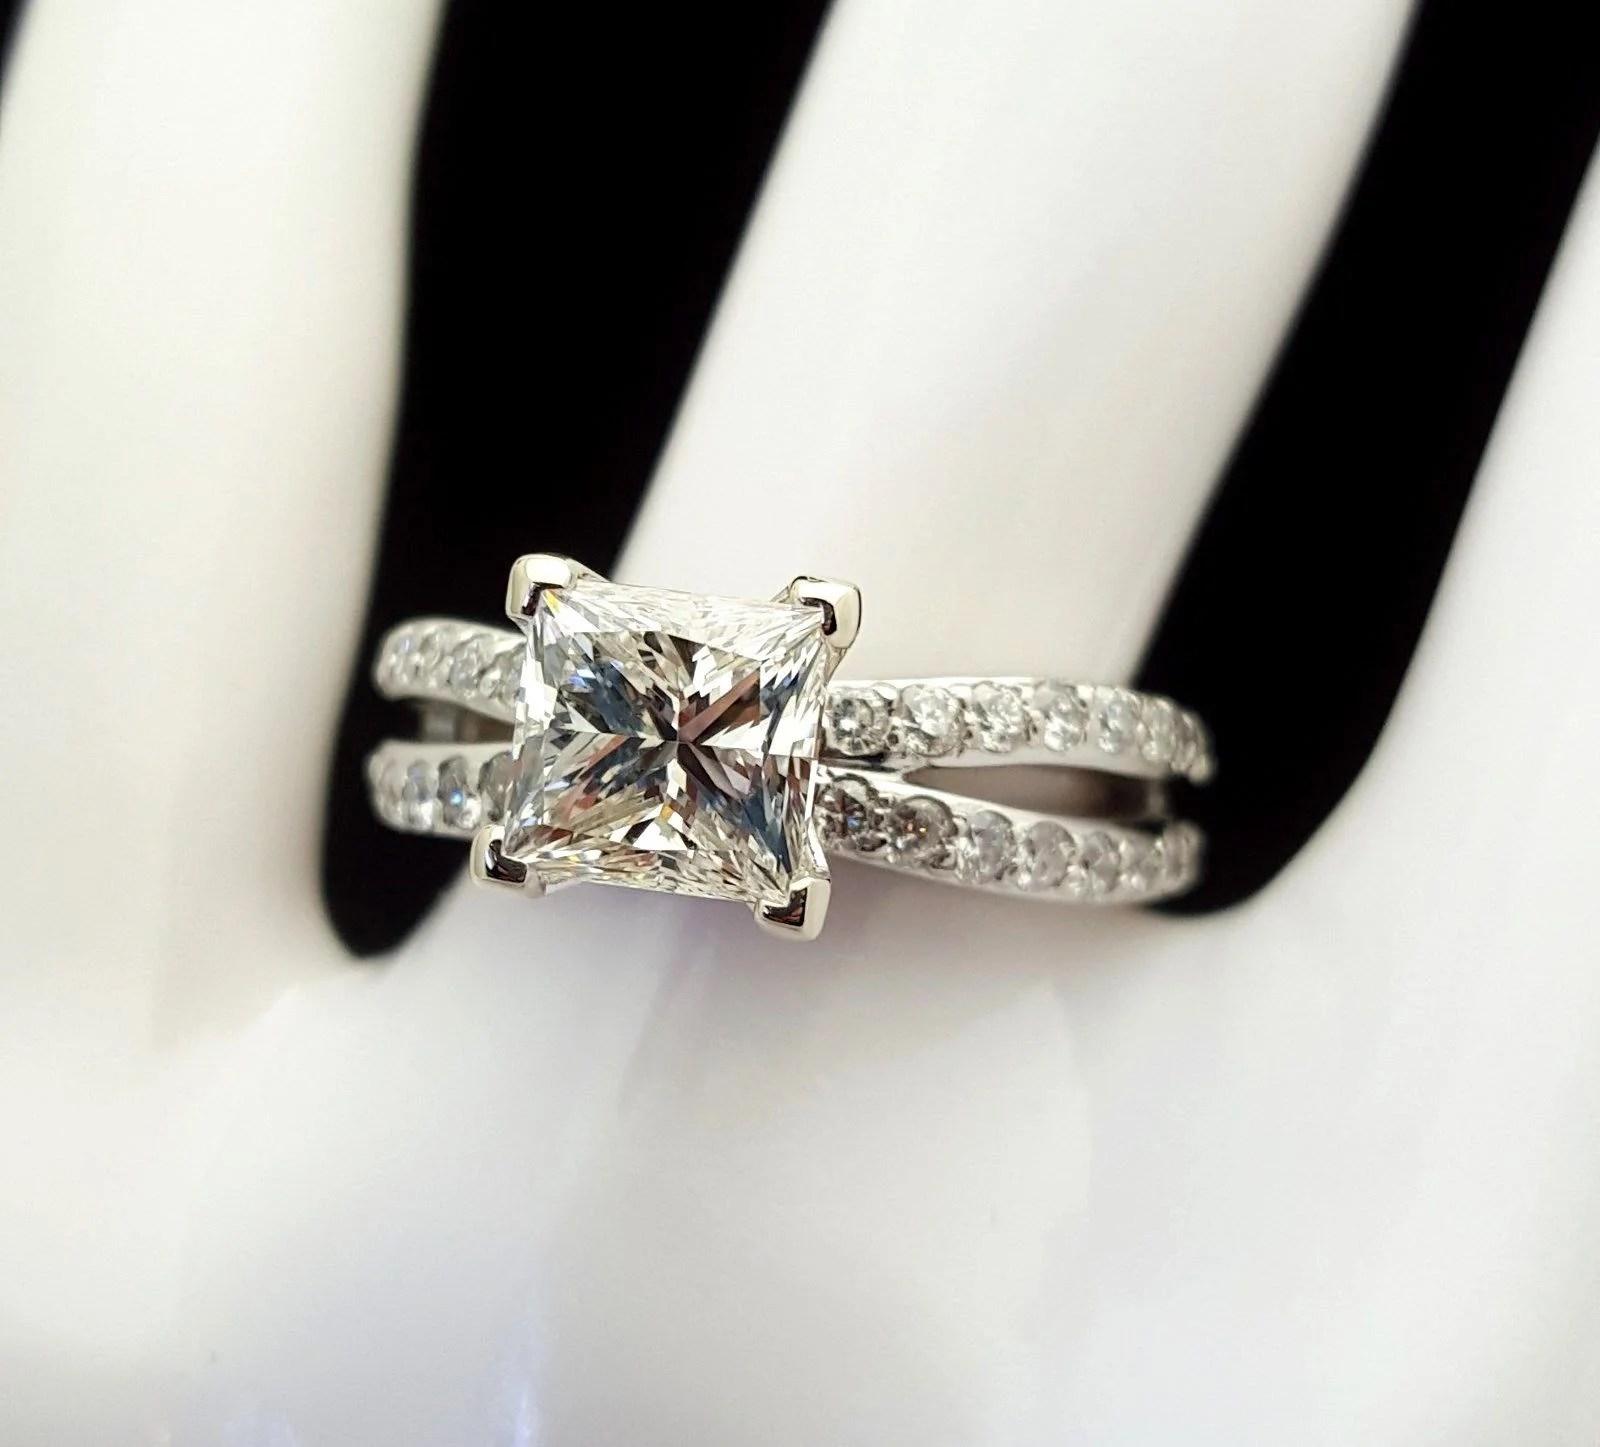 2 Carat Princess Cut Diamond Emgagement Ring - Banque